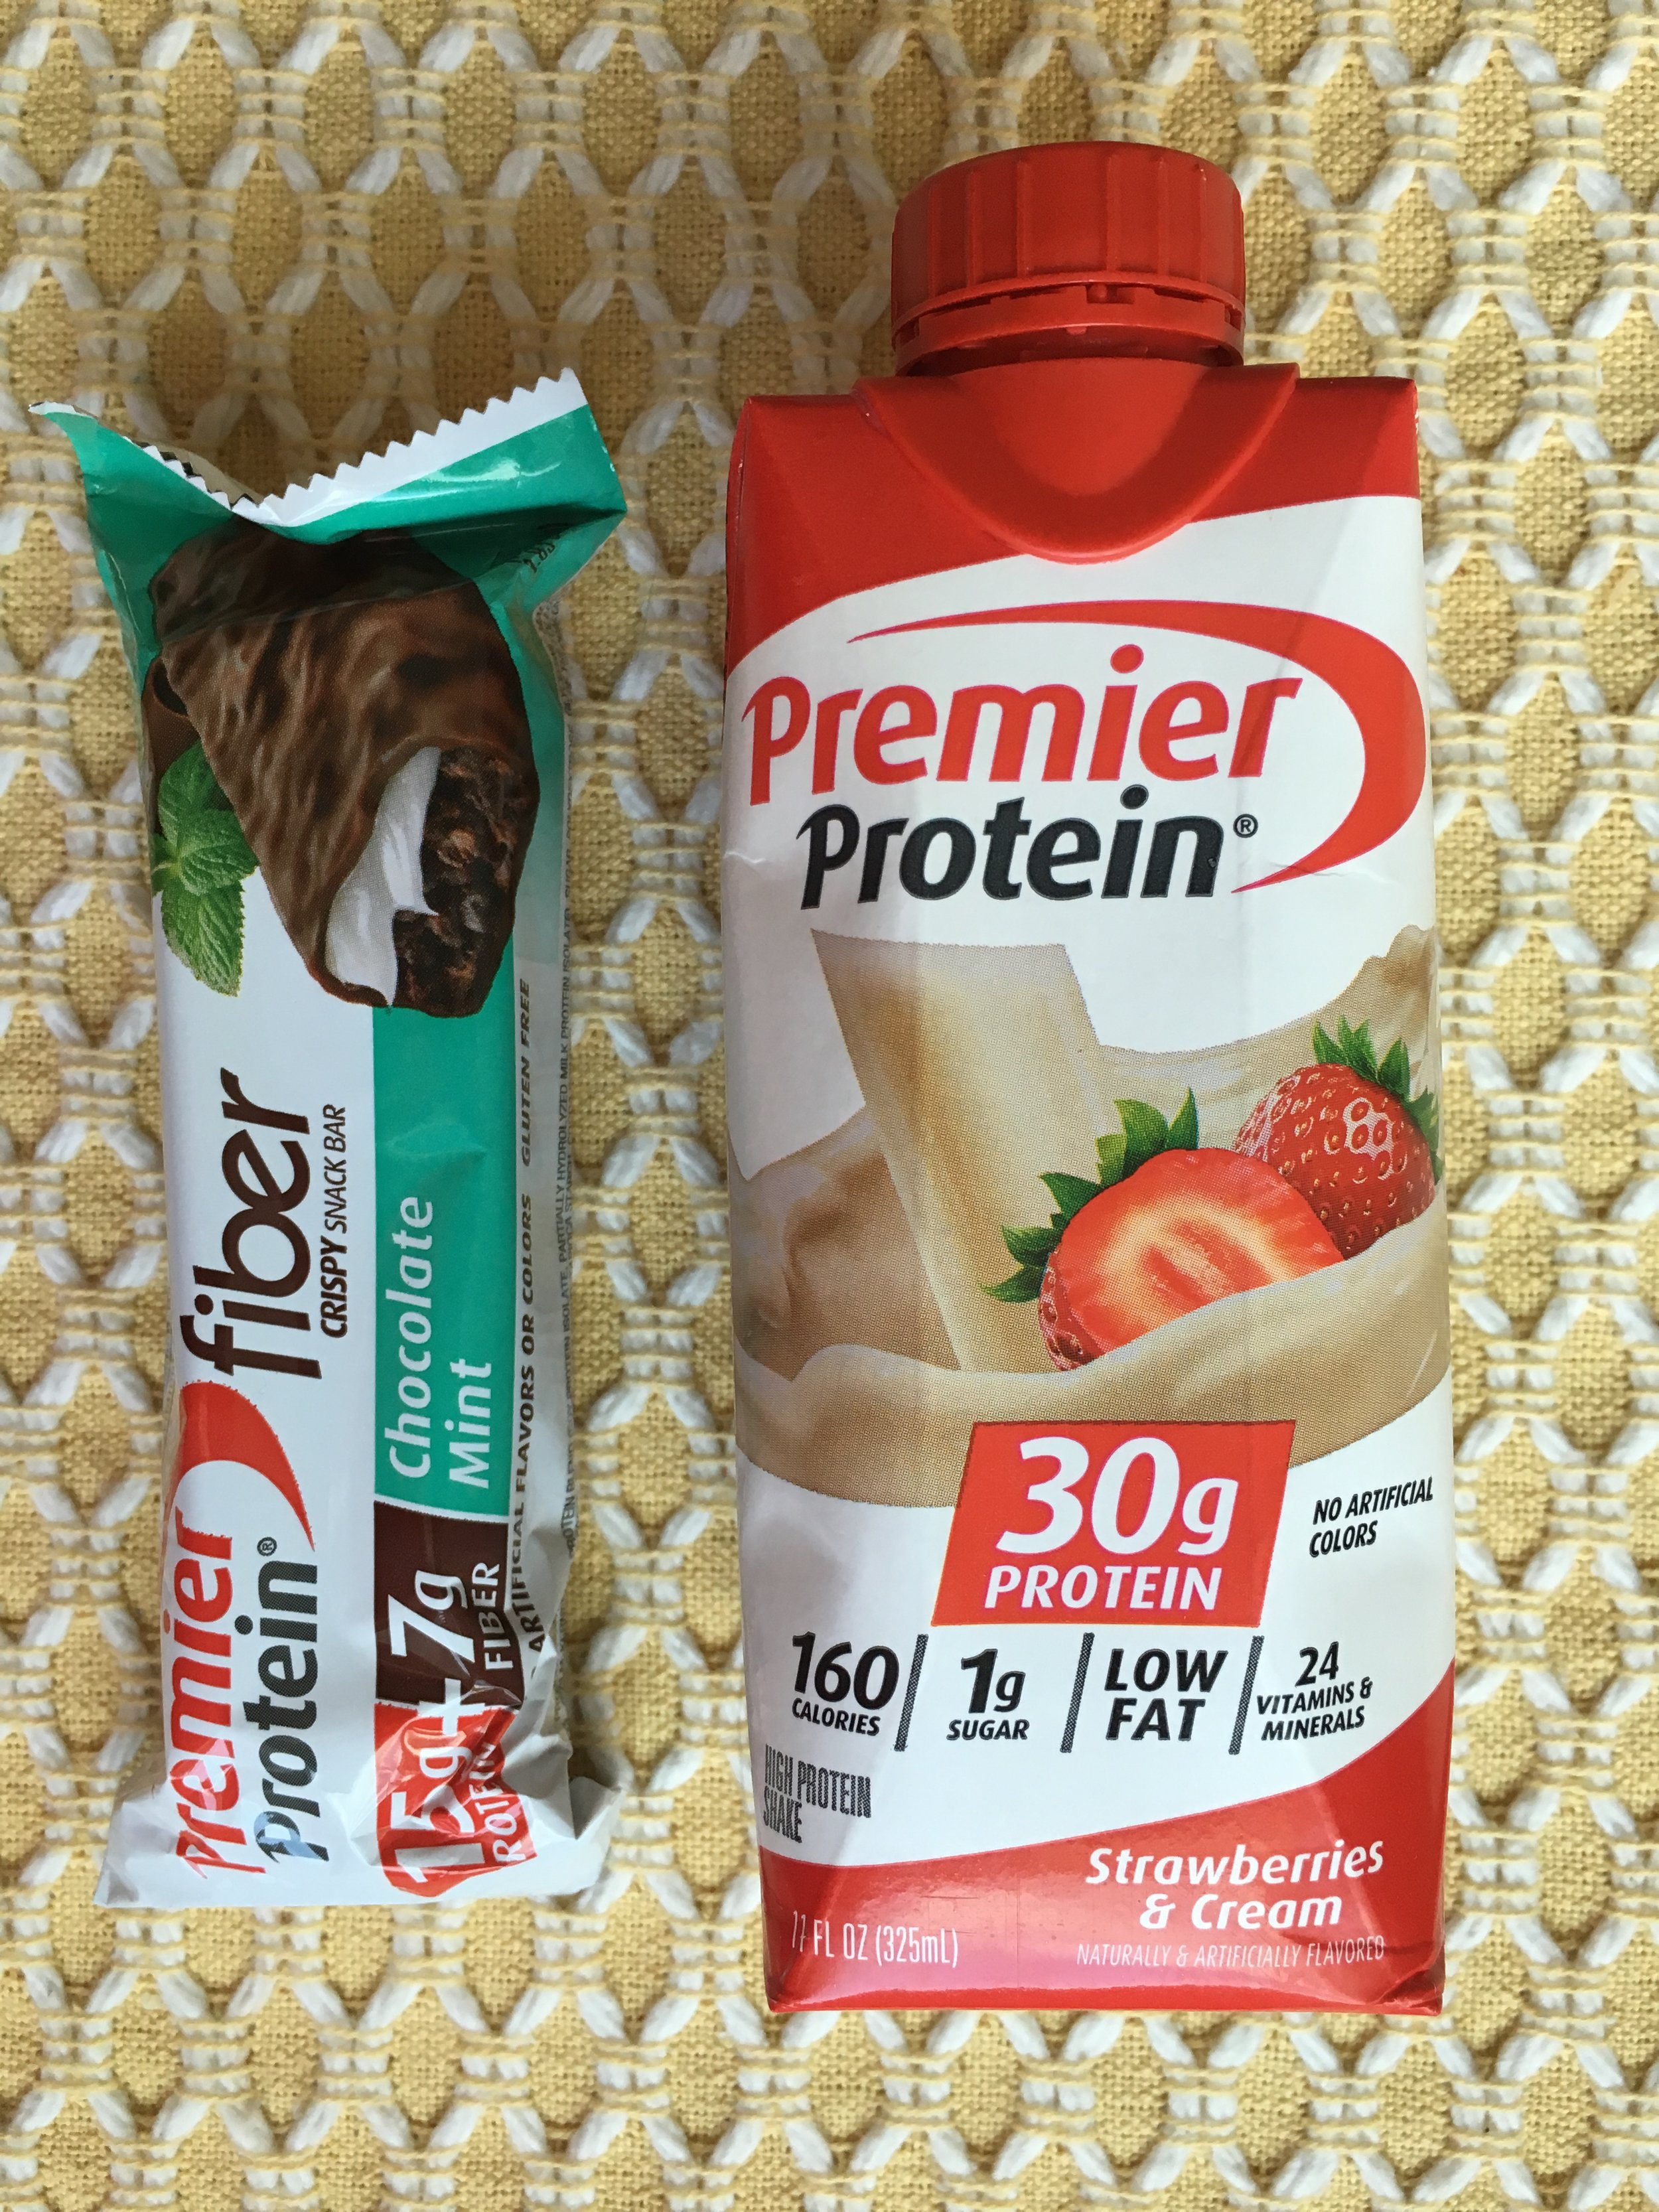 Low sugar premier protein